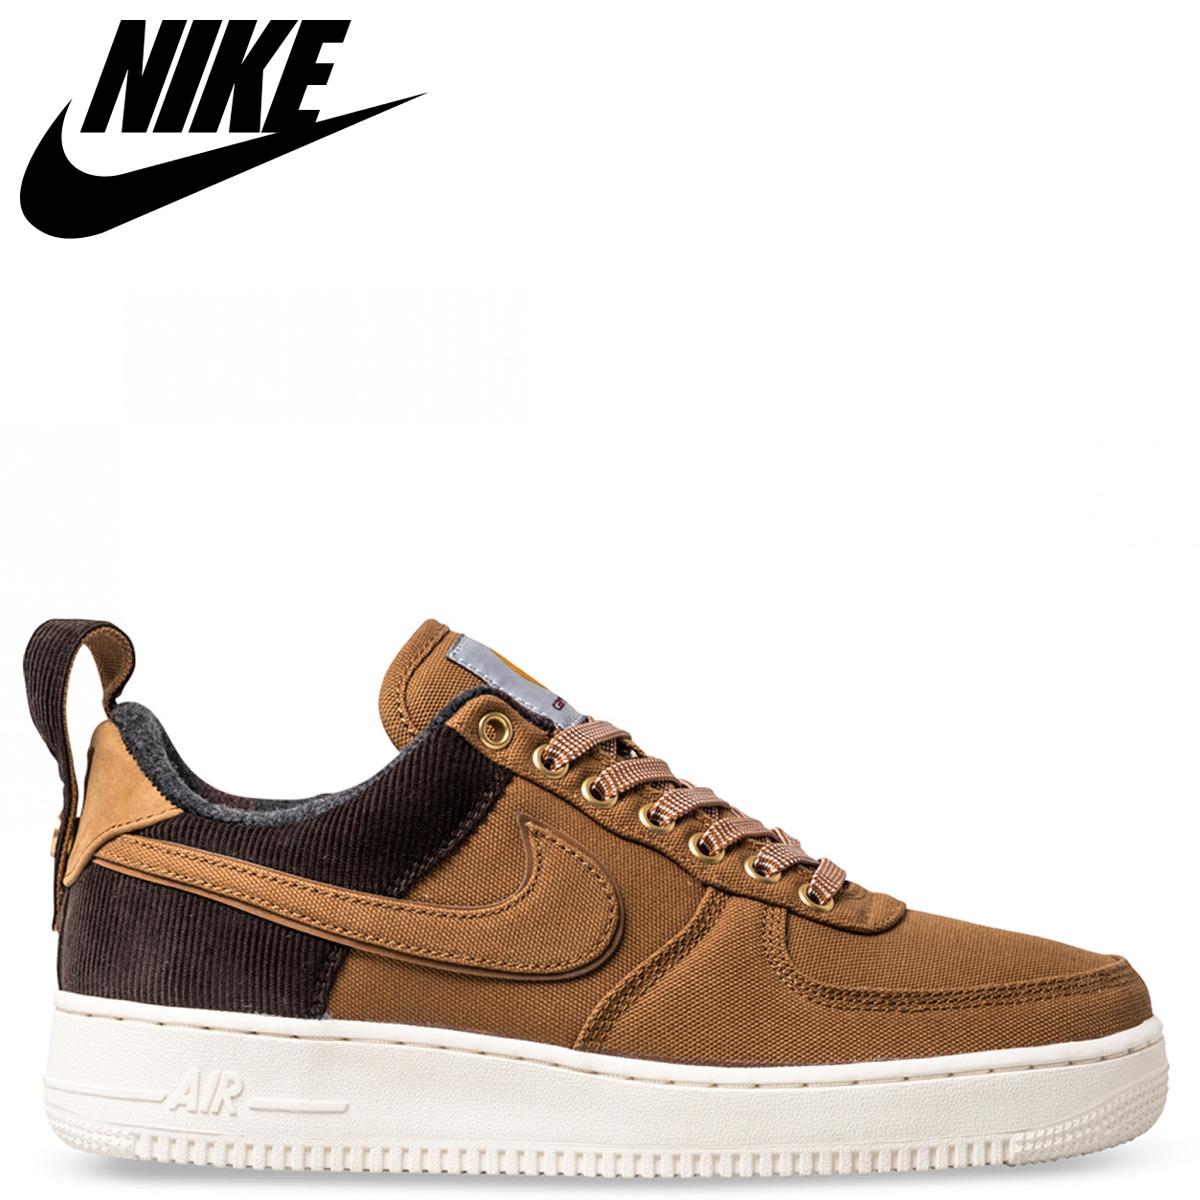 b474e7a5dc NIKE Nike air force 1 sneakers men AIR FORCE 1 07 PREMIUM CARHARTT WIP  collaboration brown AV4113-200